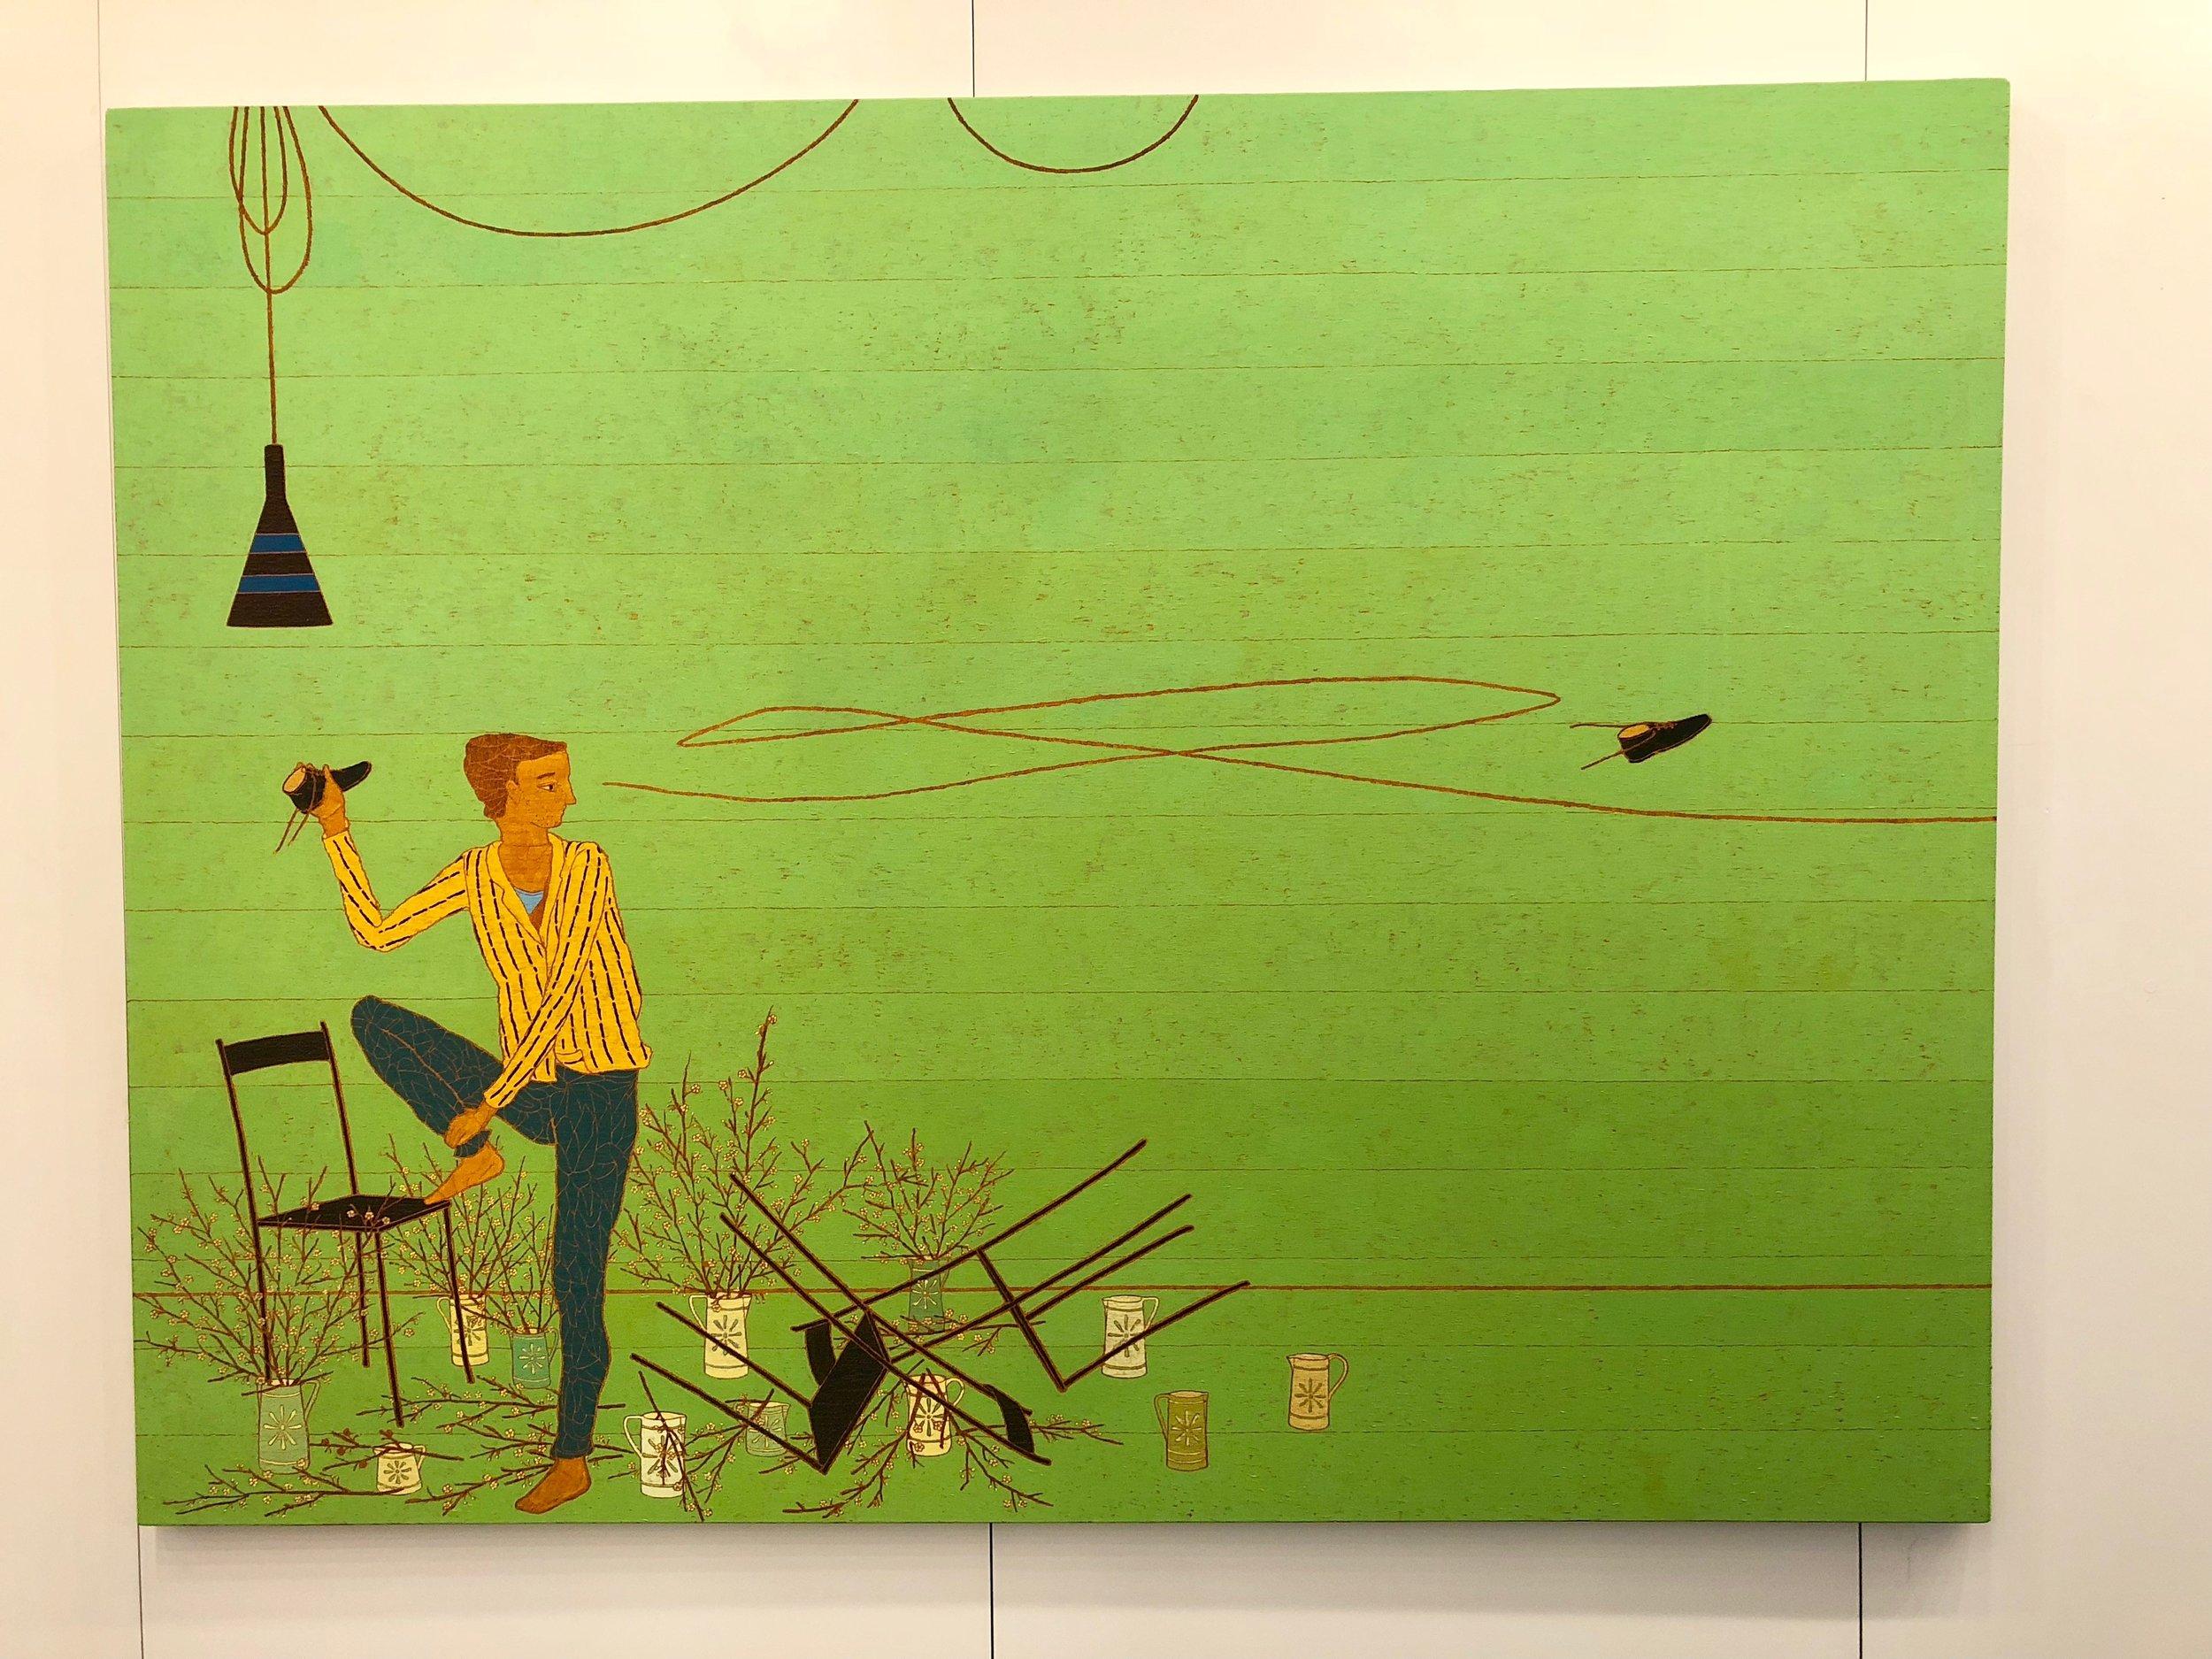 Stephen Chambers RA at Atelier Rose & Gray